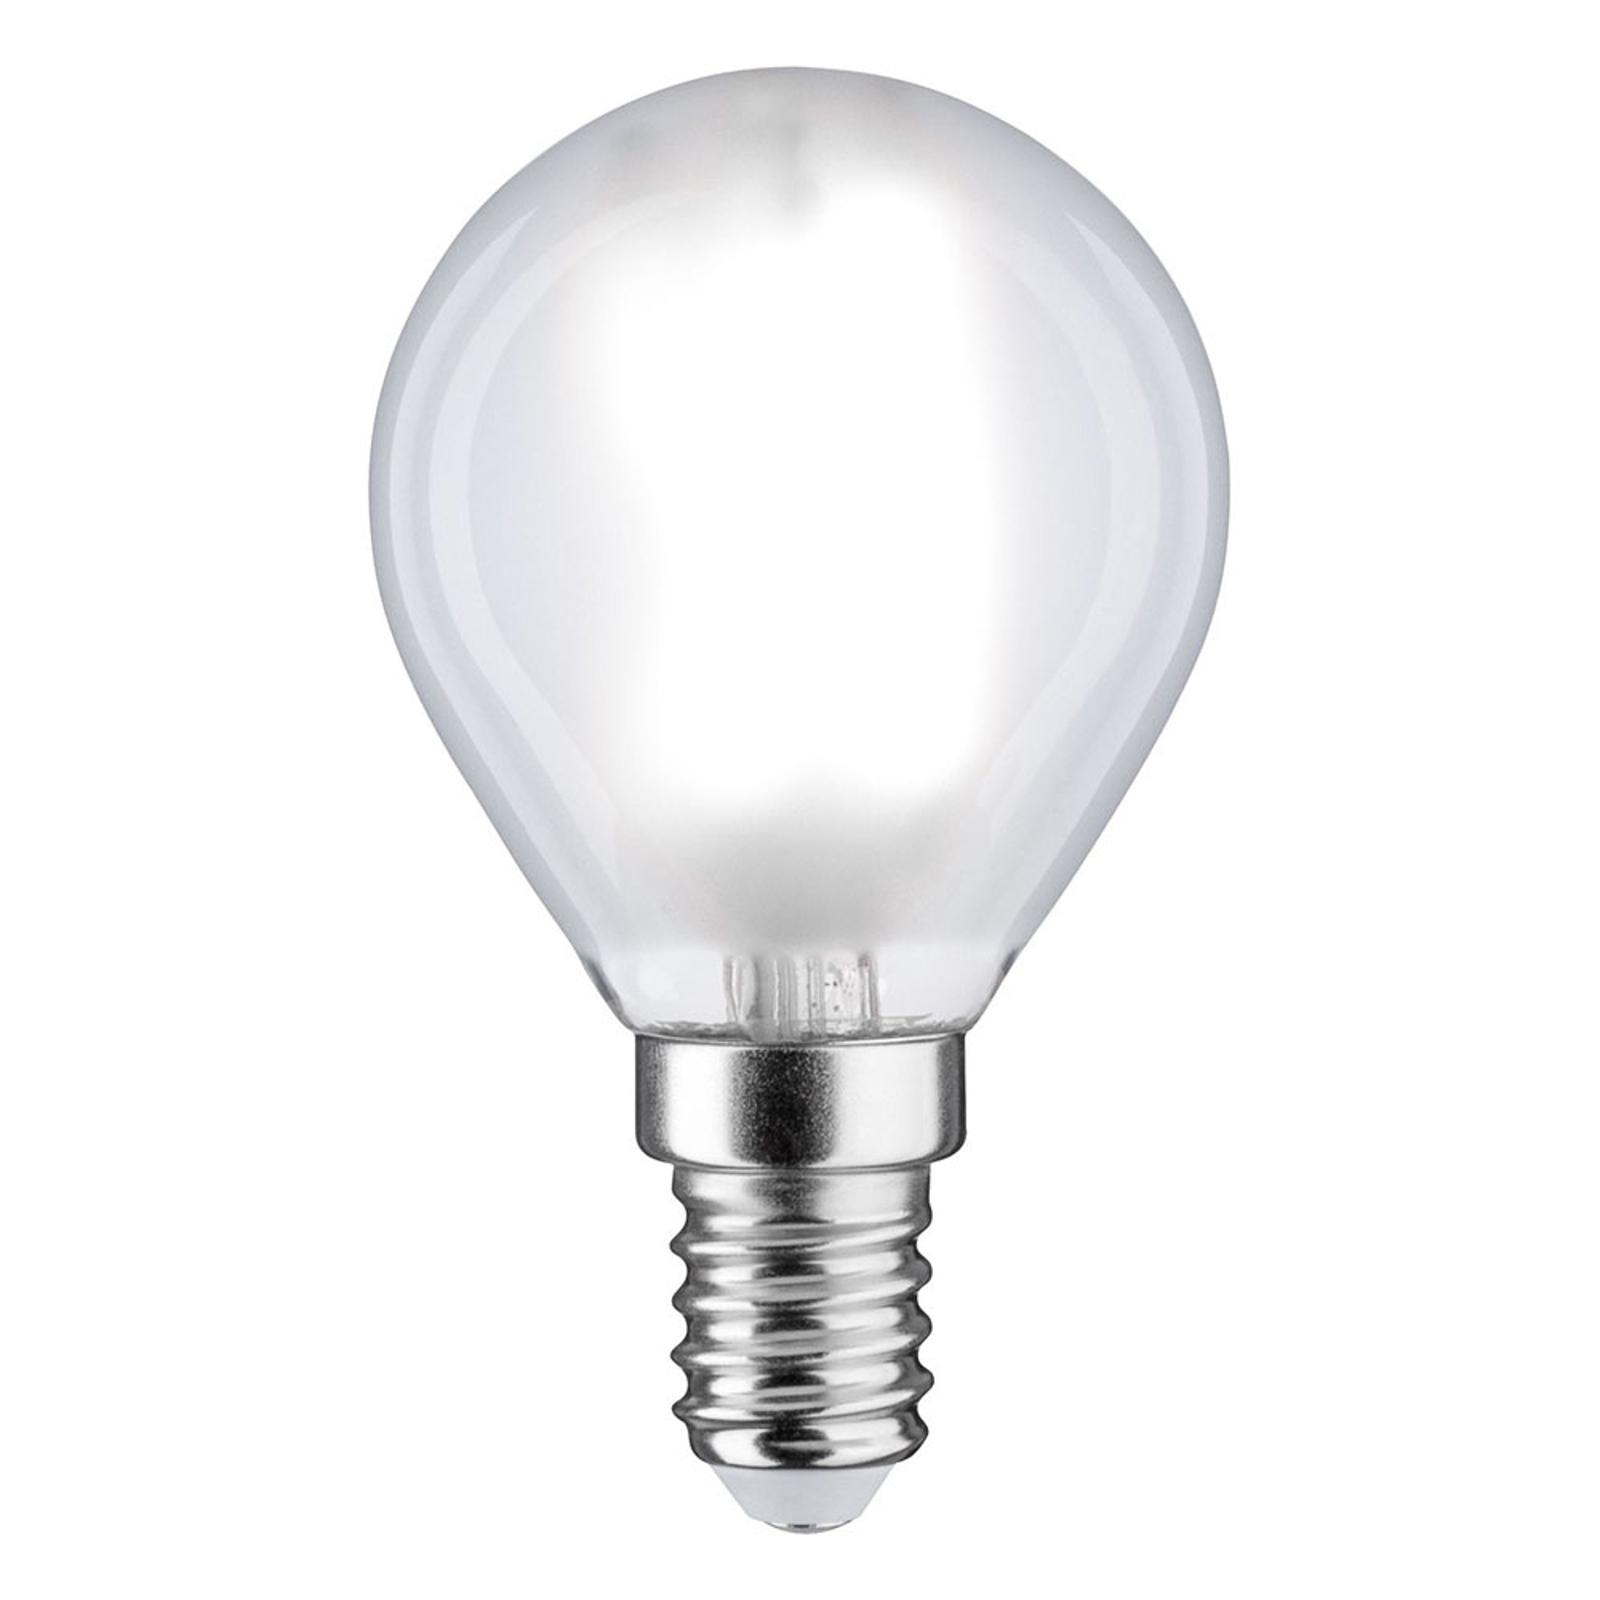 Paulmann żarówka kropla LED E14 5W 865 470 lm dim